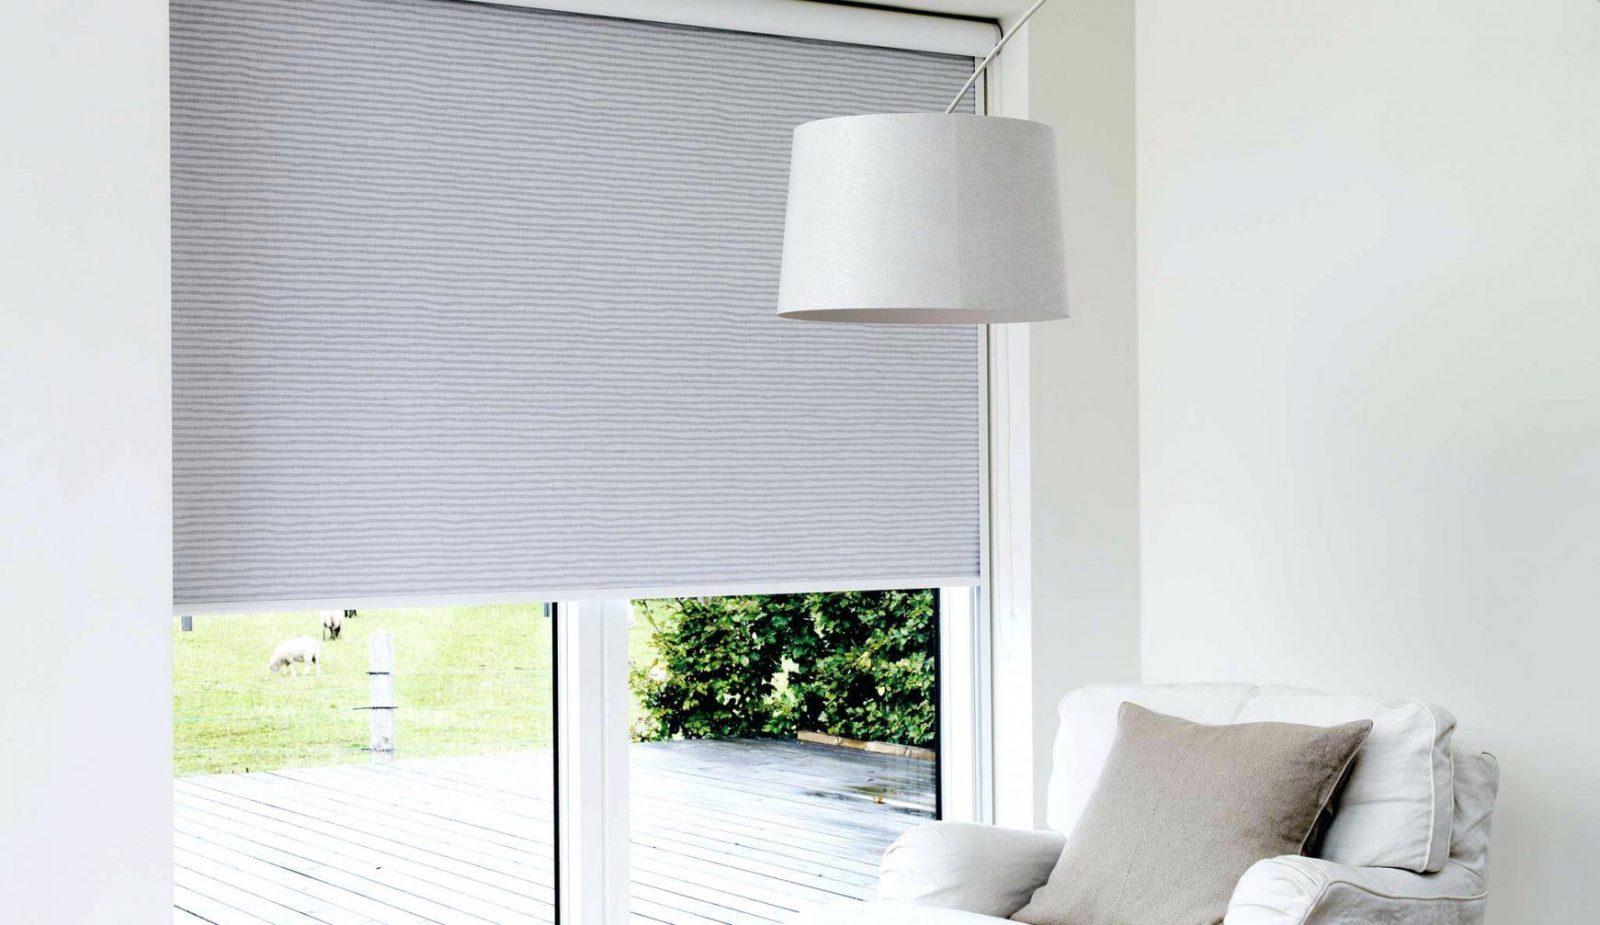 Fenster Sichtschutz Innen Ikea | Haus Design Ideen